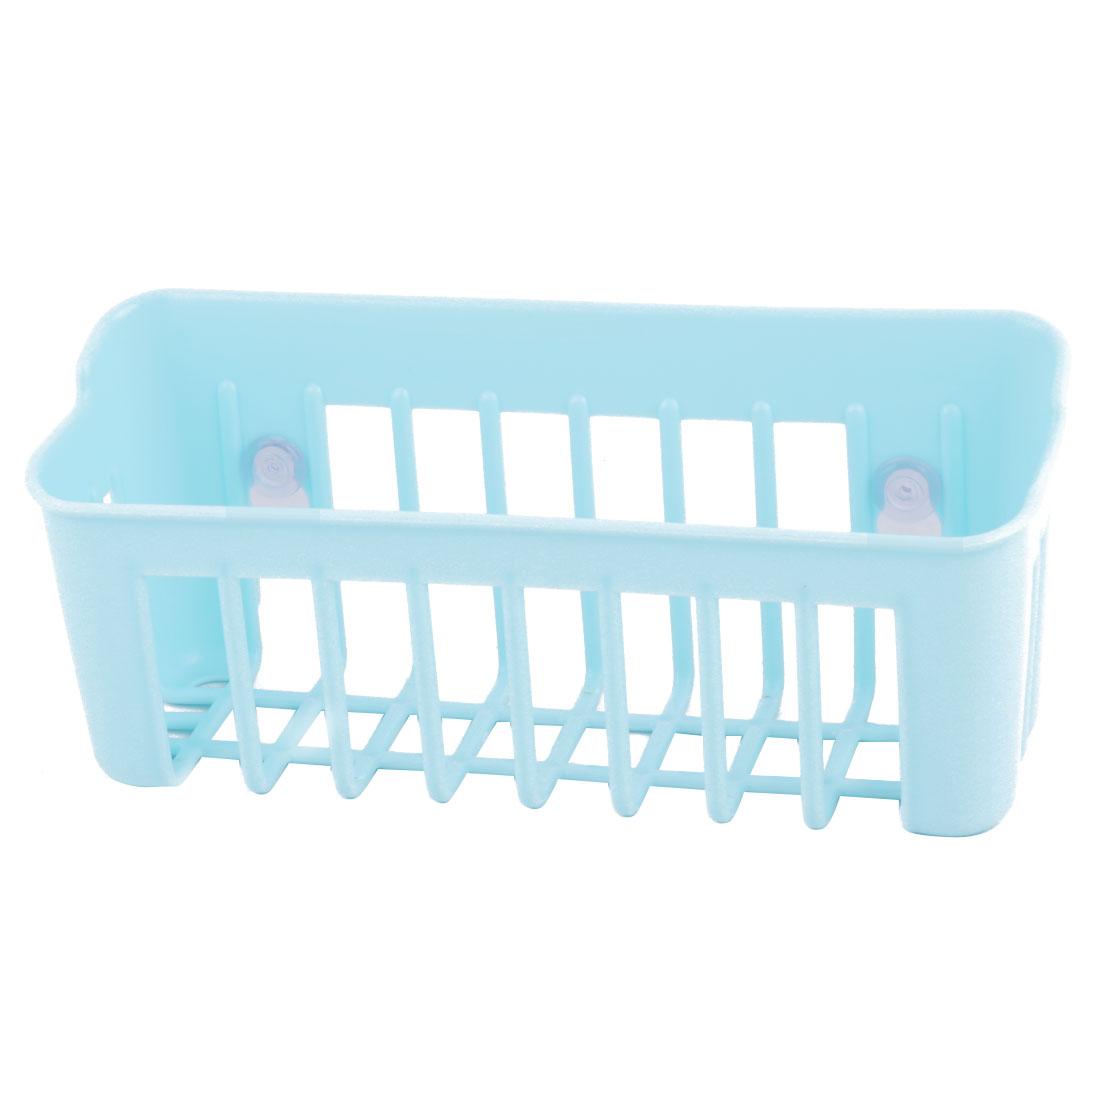 Kitchen Plastic Suction Cup Design Scrubber Sponge Holder Organizer Sky Blue